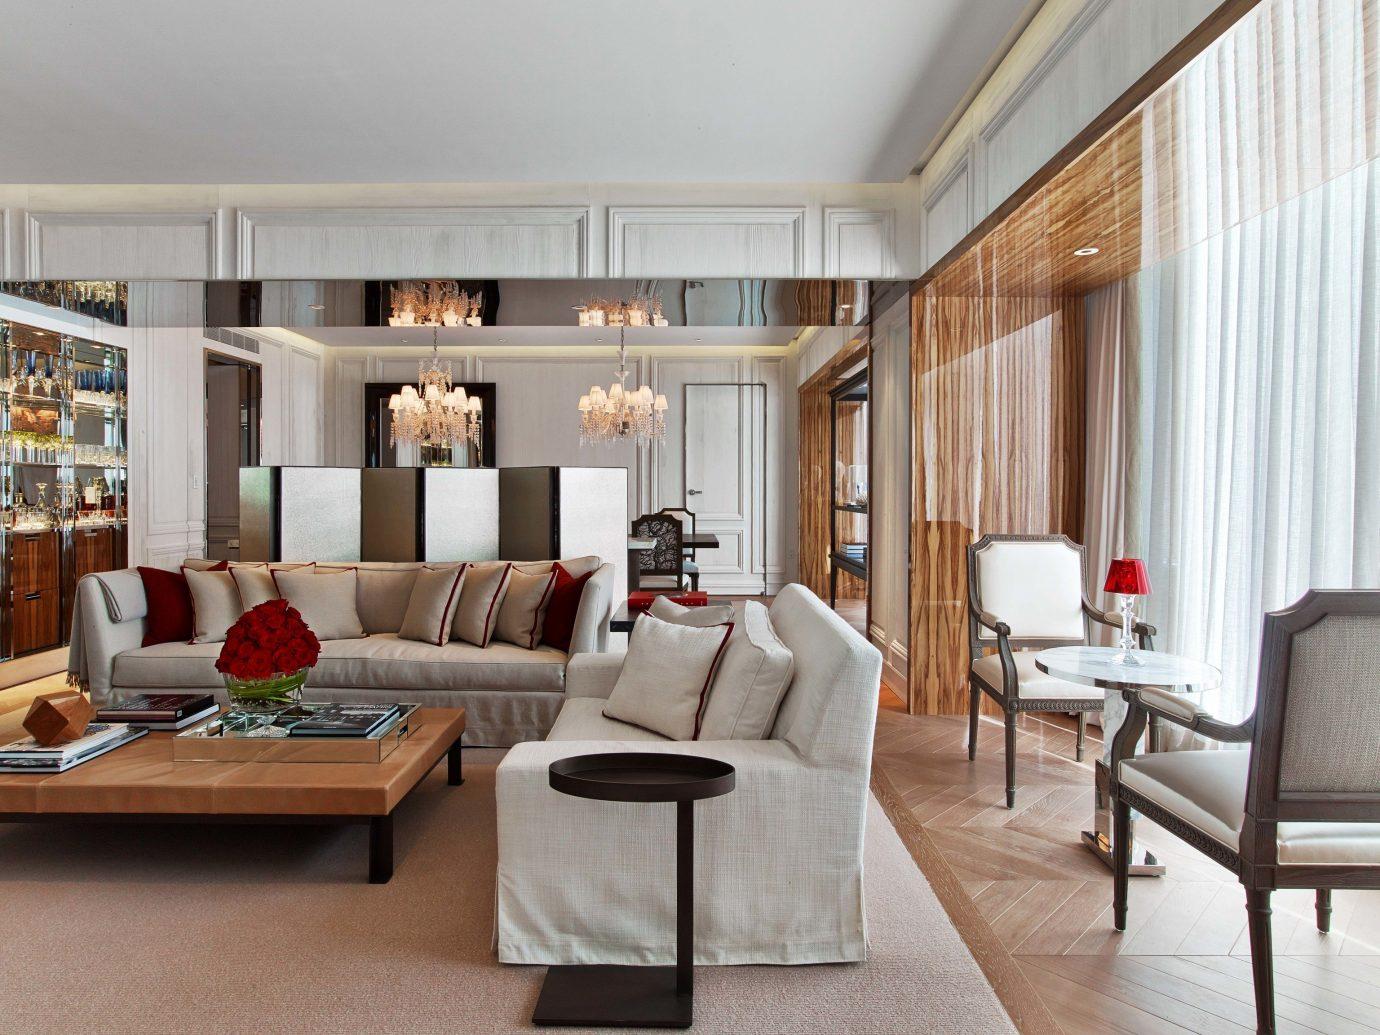 Hotels Luxury Travel floor indoor room living room Living interior design chair window wall ceiling furniture home interior designer decorated area